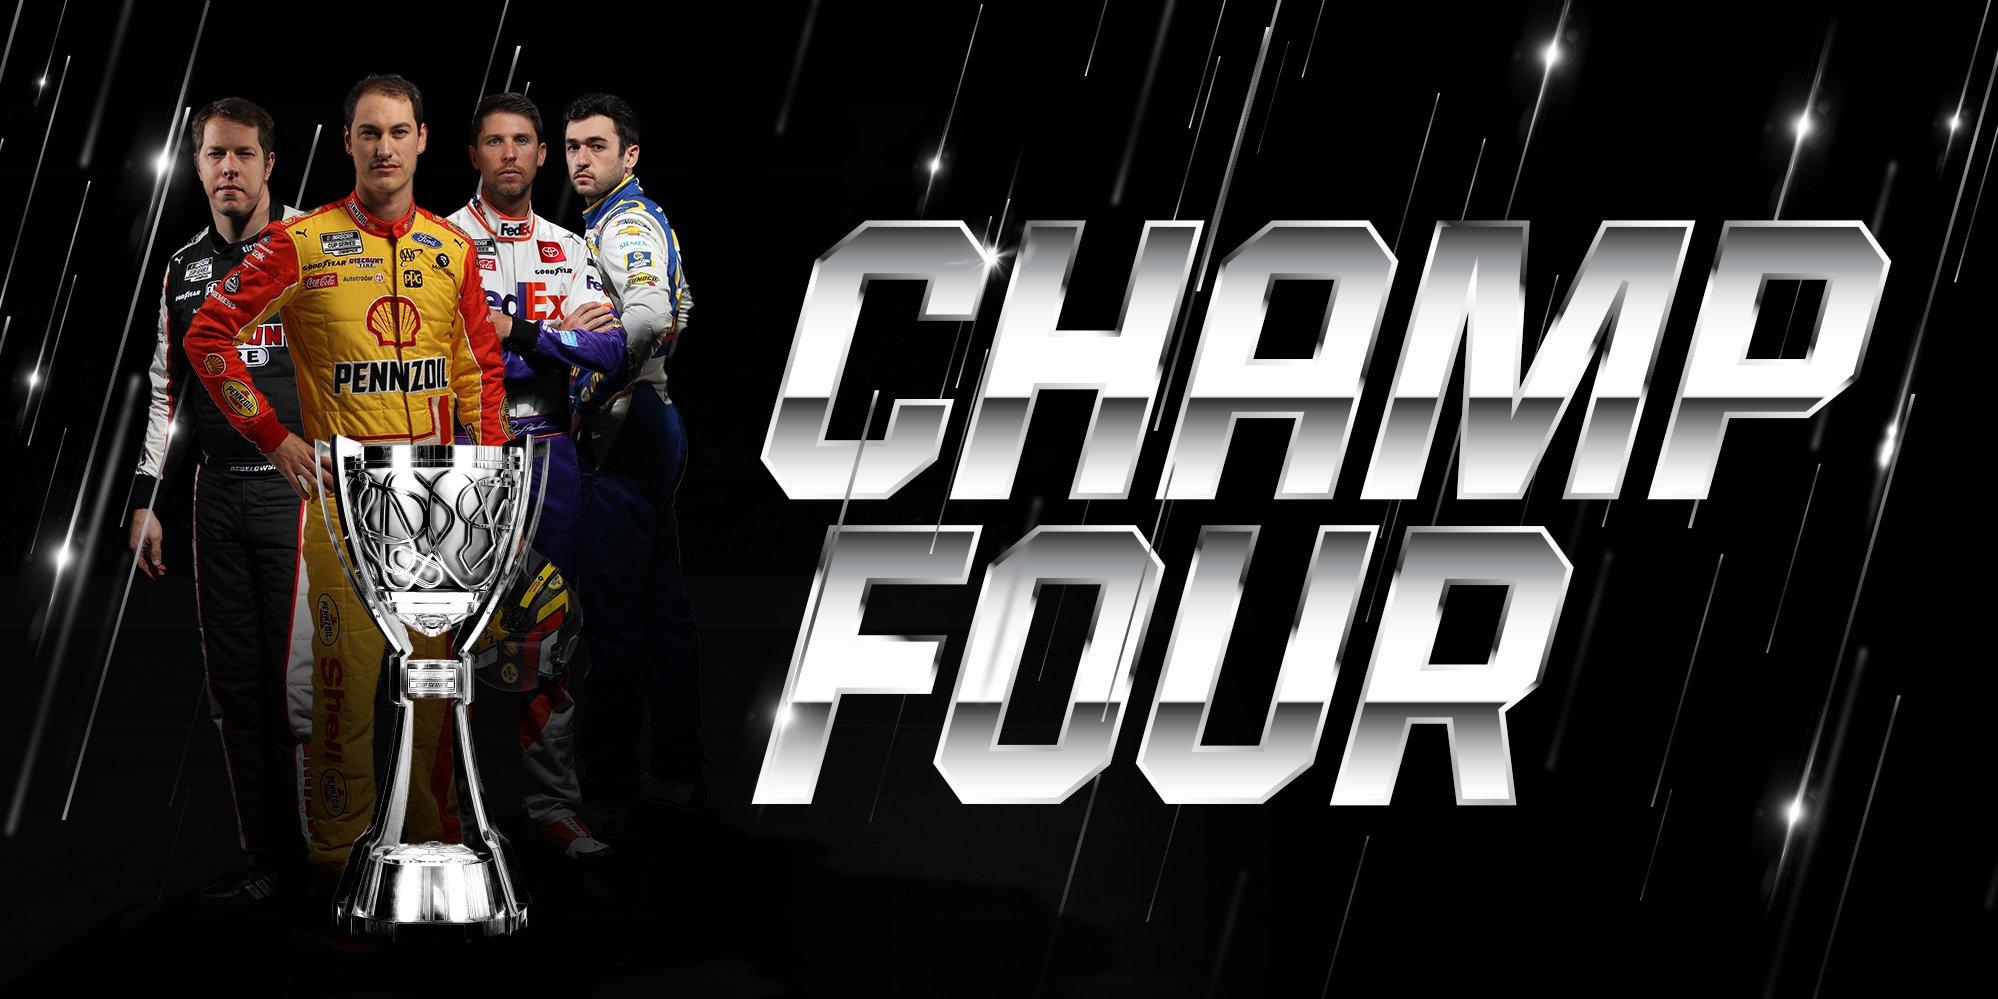 2, Brad Keselowski, 22, Joey Logano, Team Penske, 9, Chase Elliot, Hendrick Motorsports, 11, Denny Hamlin, Joe Gibbs Racing